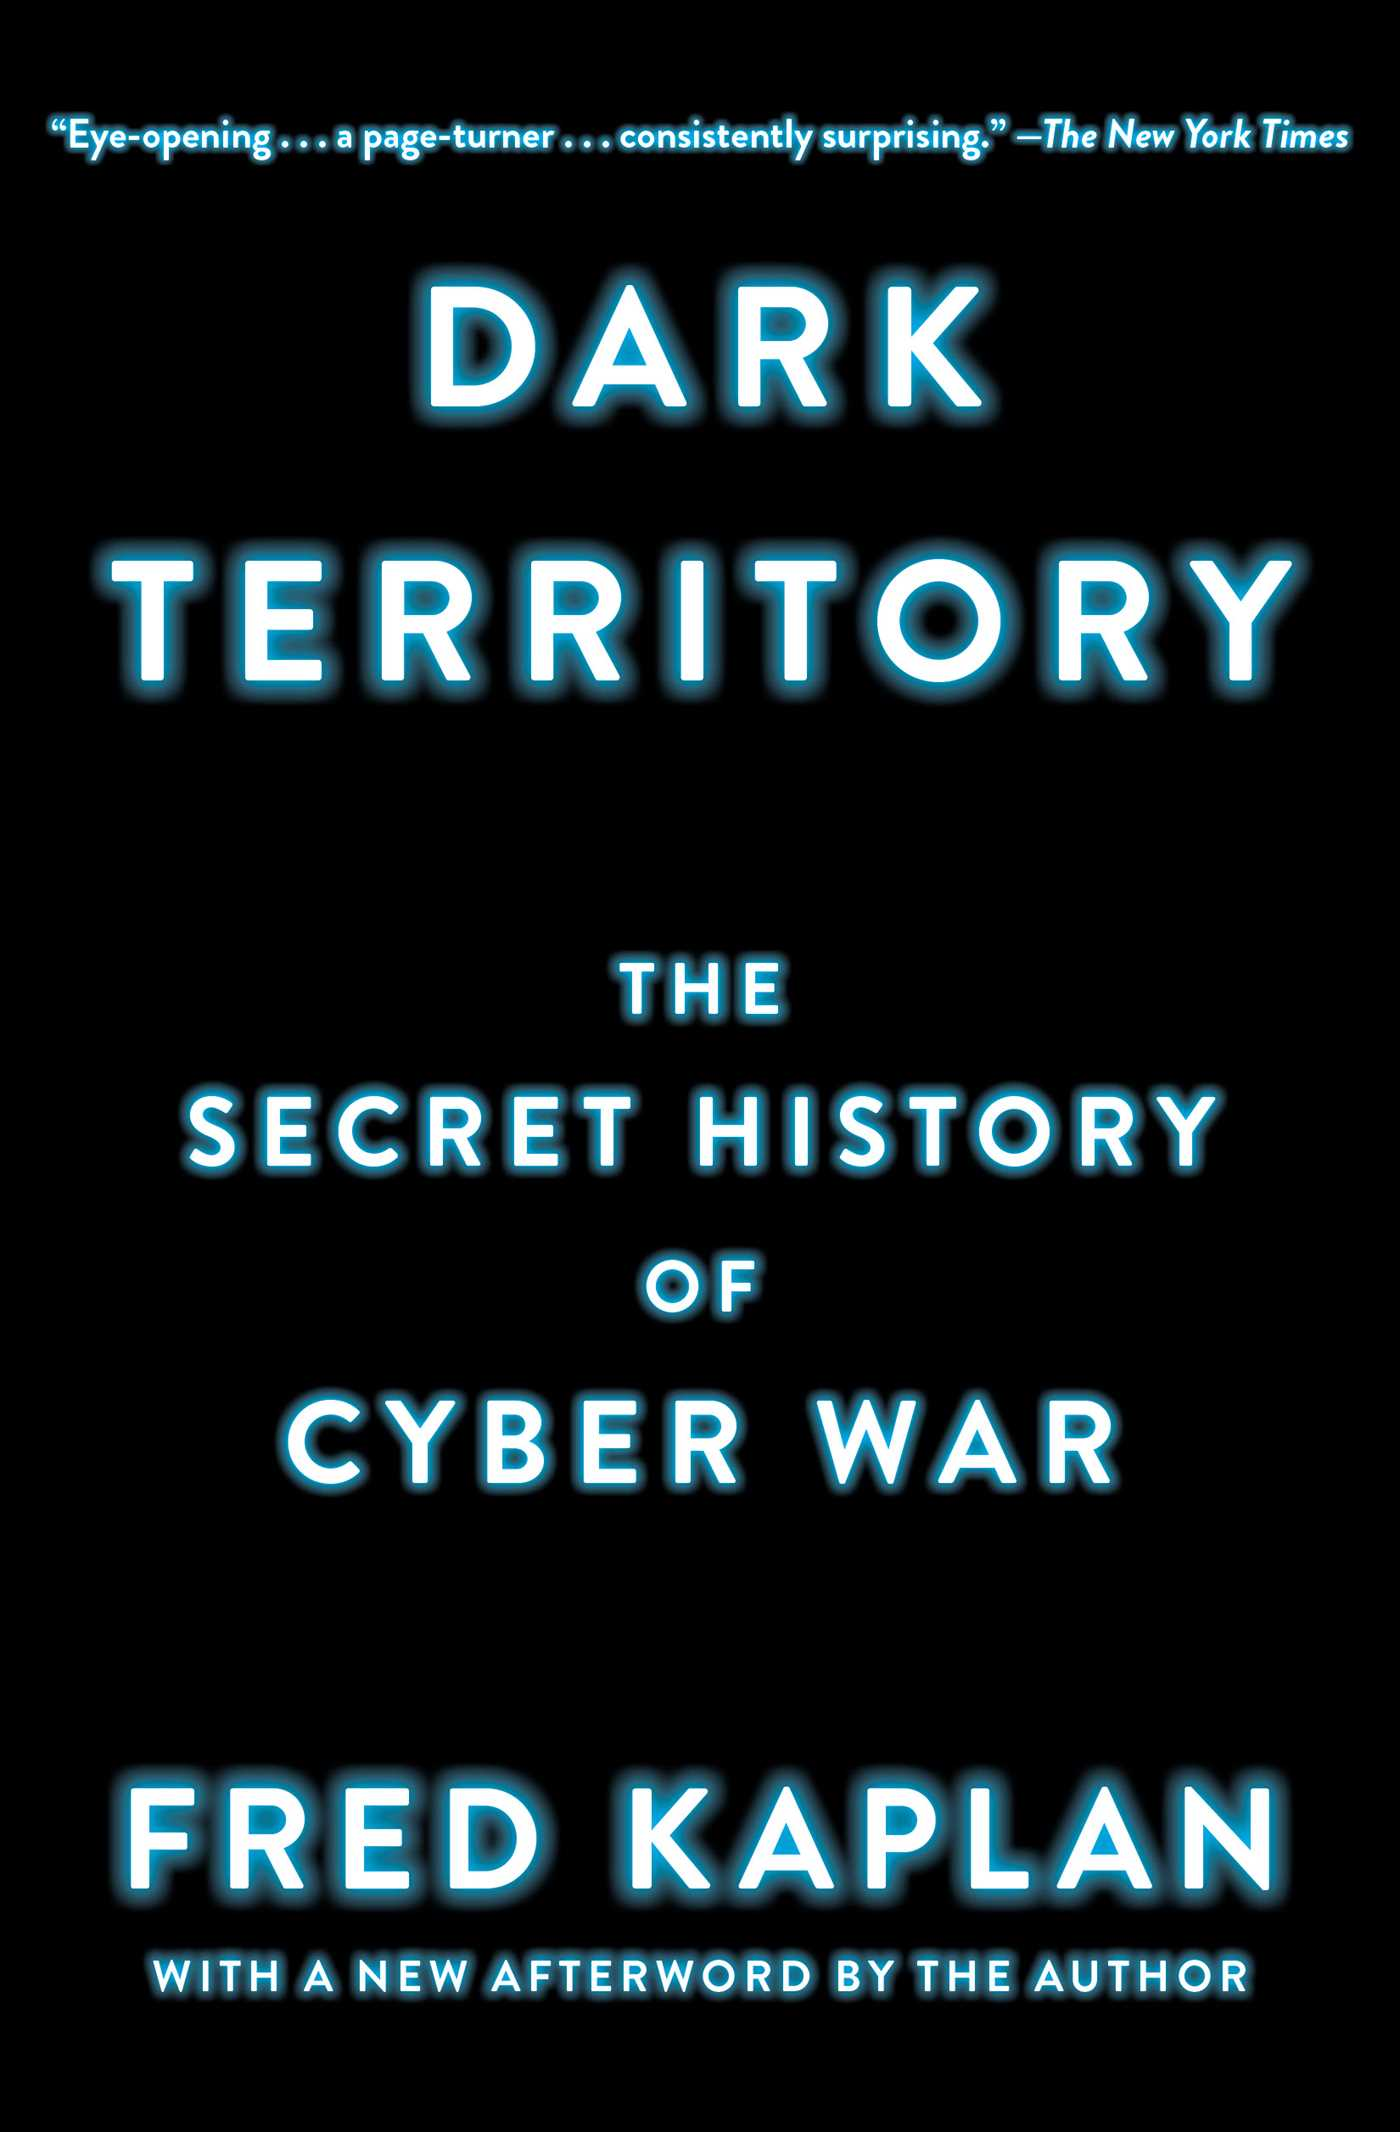 Dark territory 9781476763262 hr